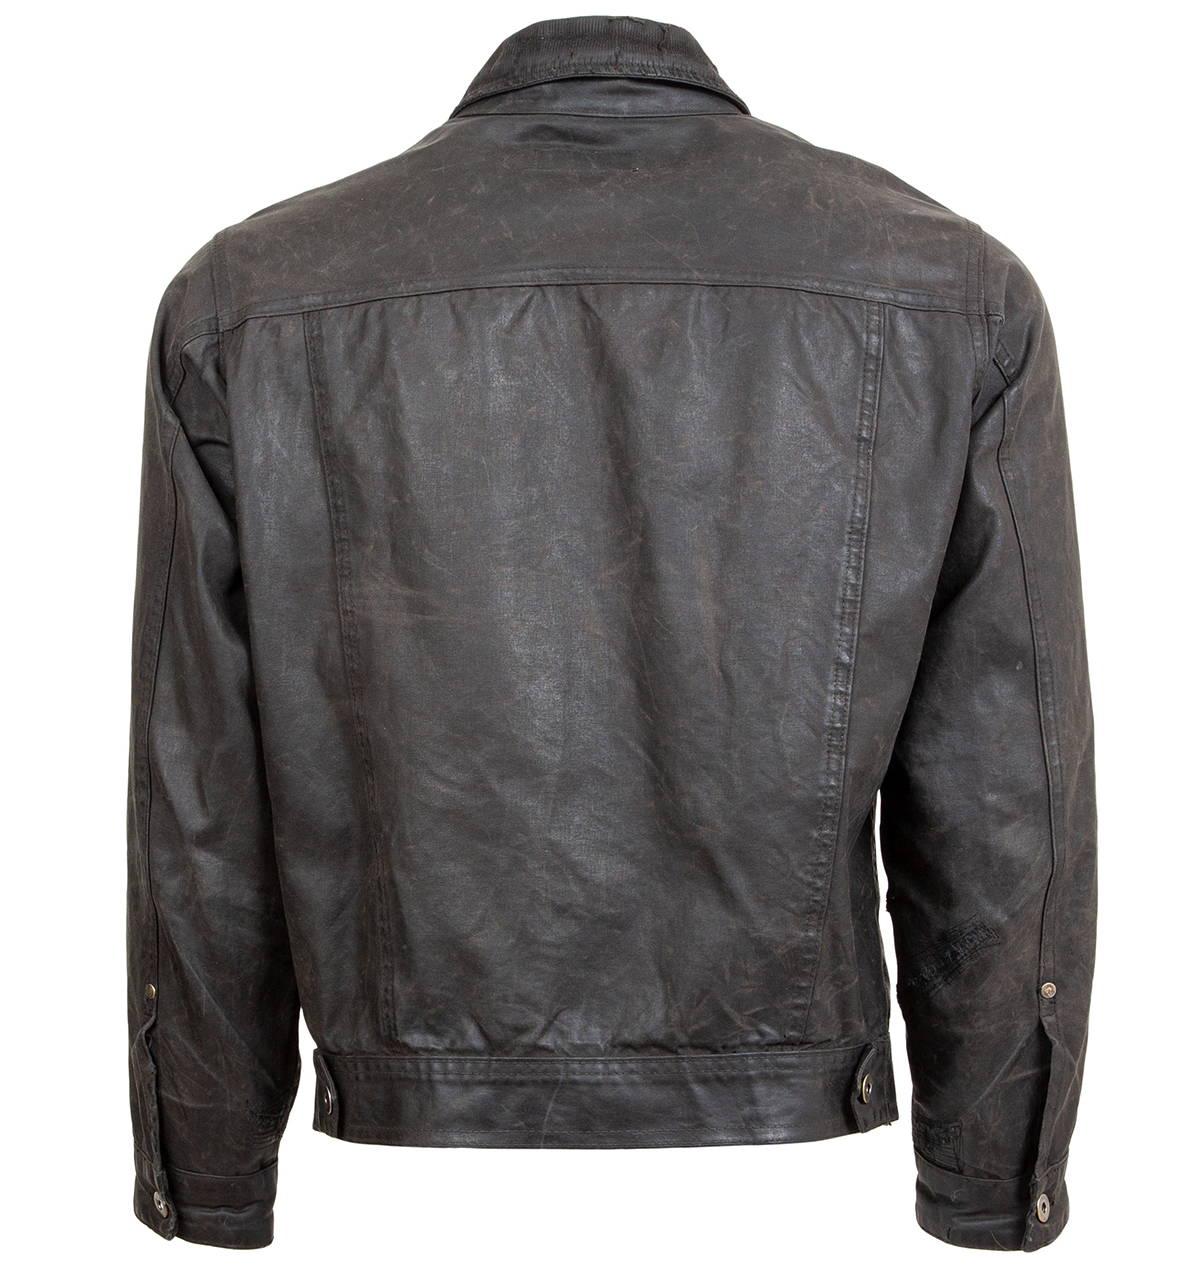 Iron & Resin Rambler Jacket Weathered & Worn Repaired Backside